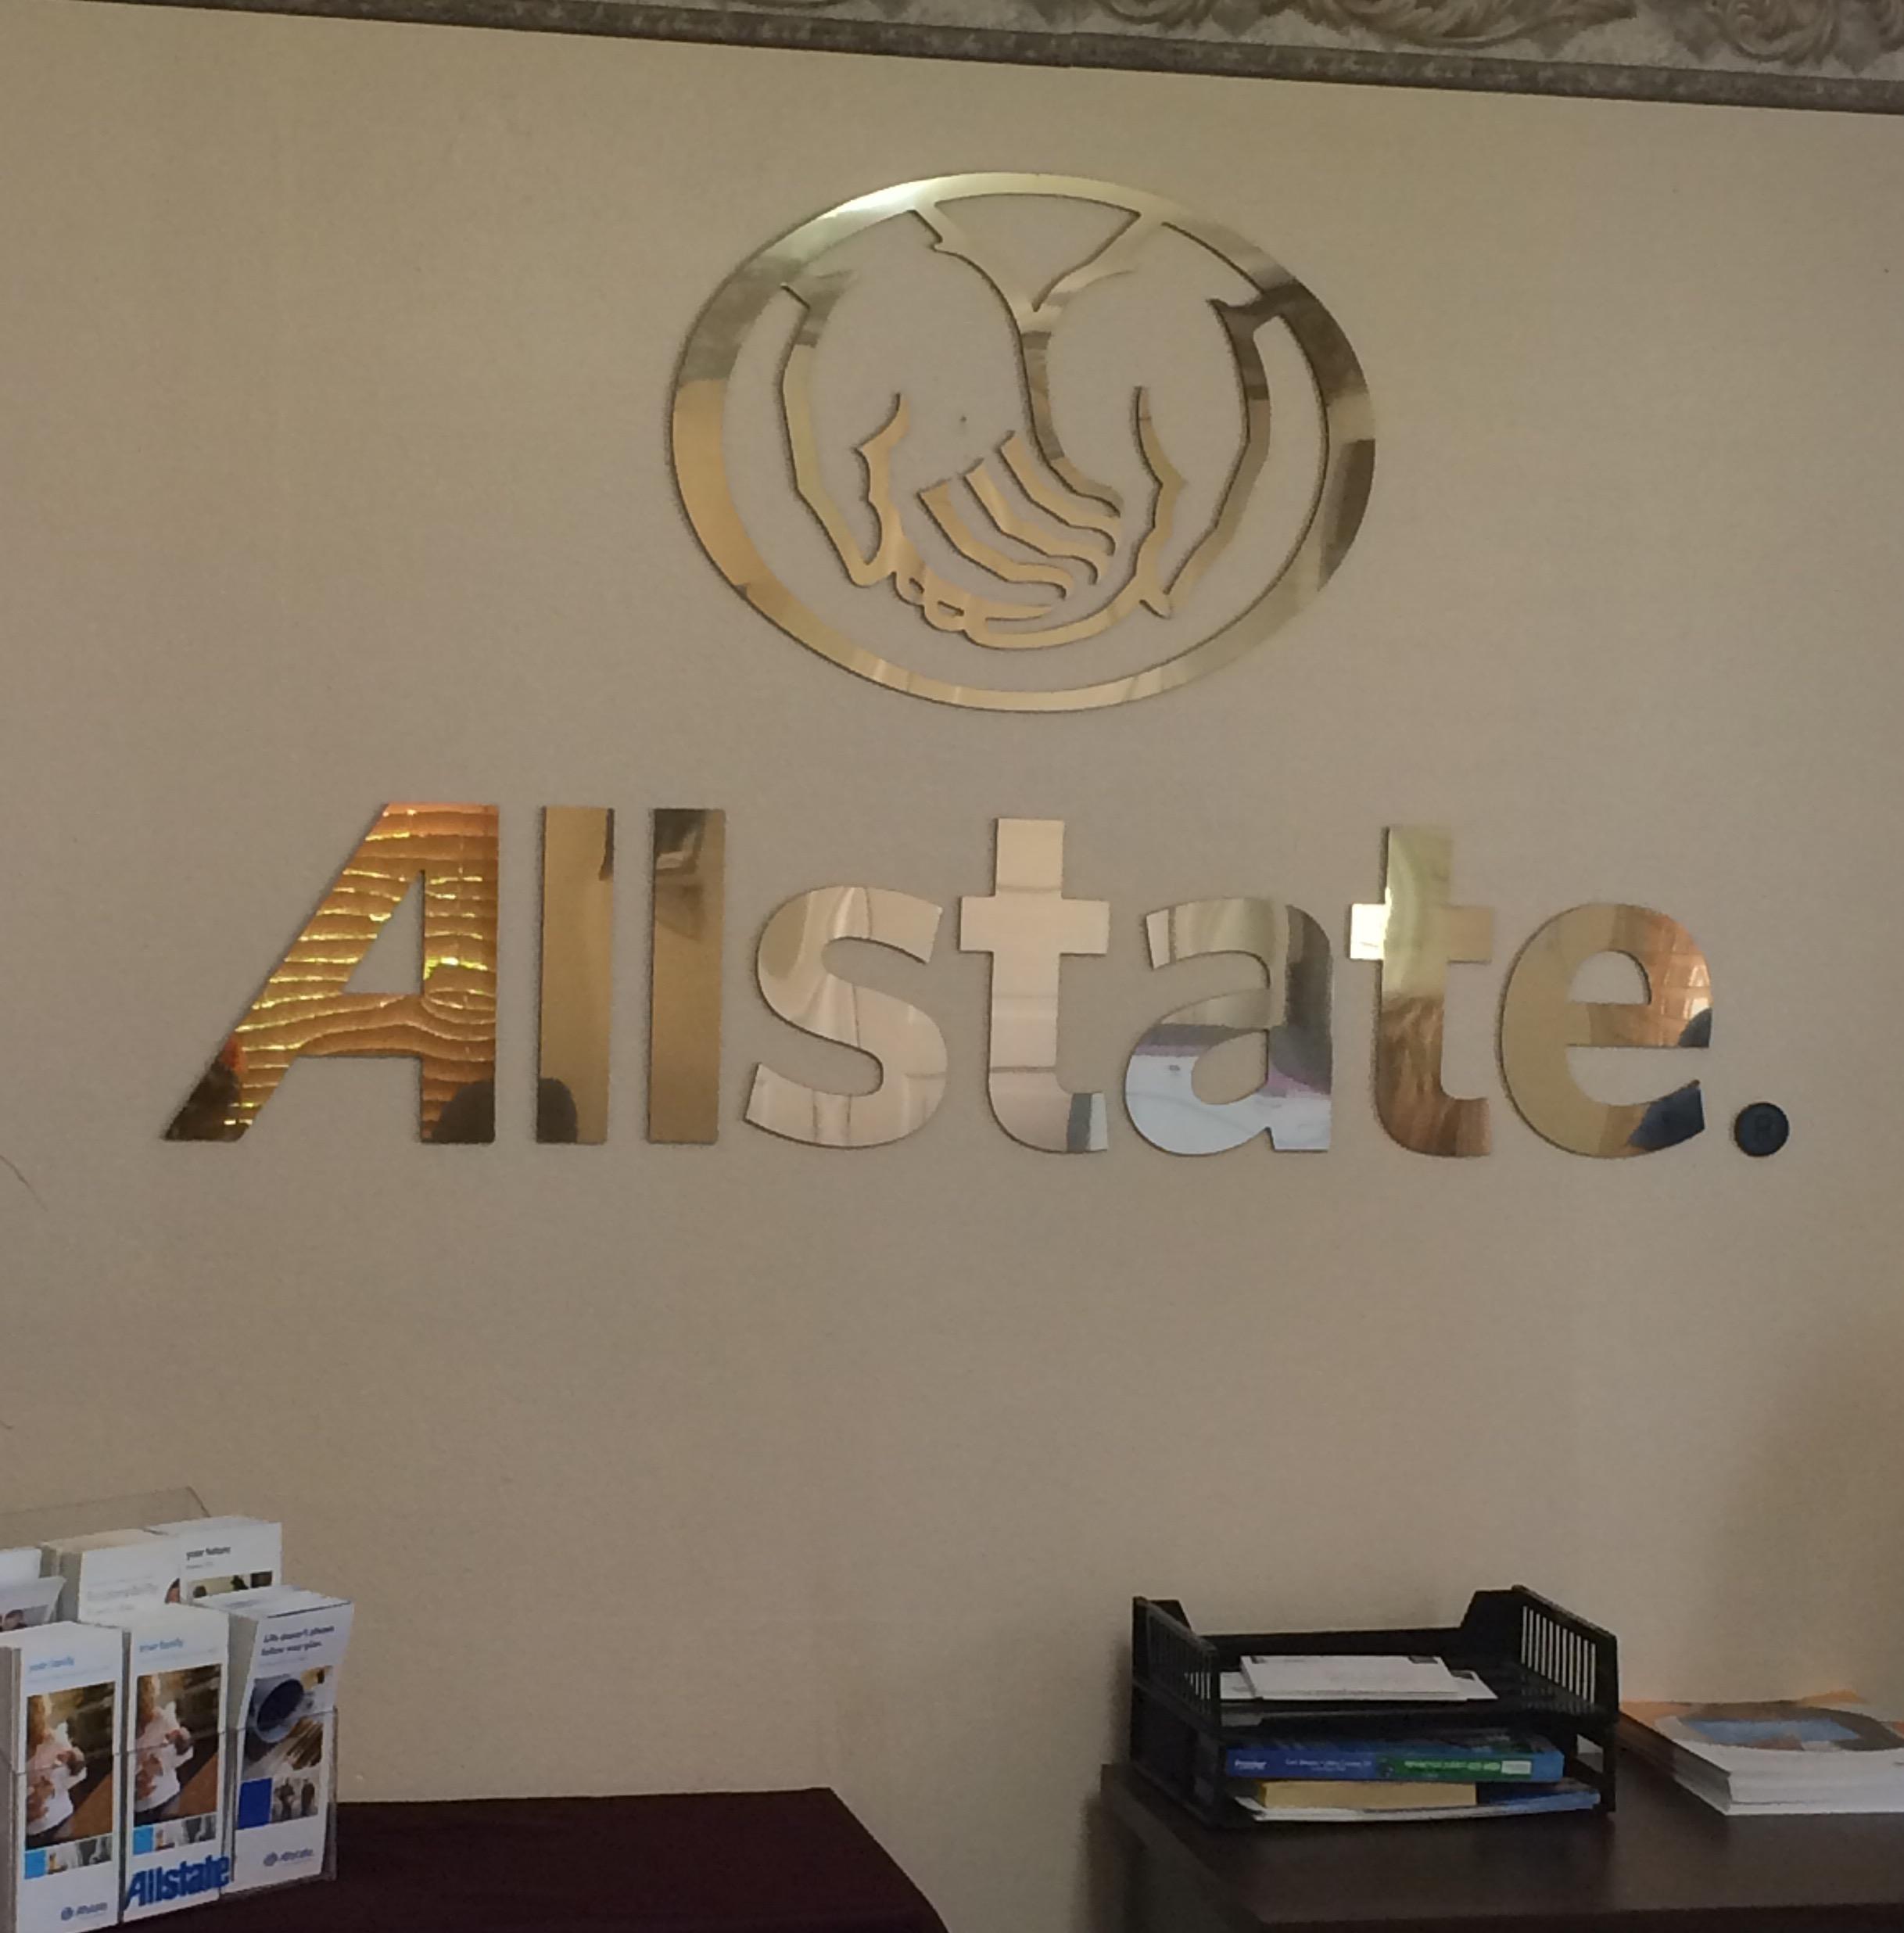 Kevin Gwozdz: Allstate Insurance image 3